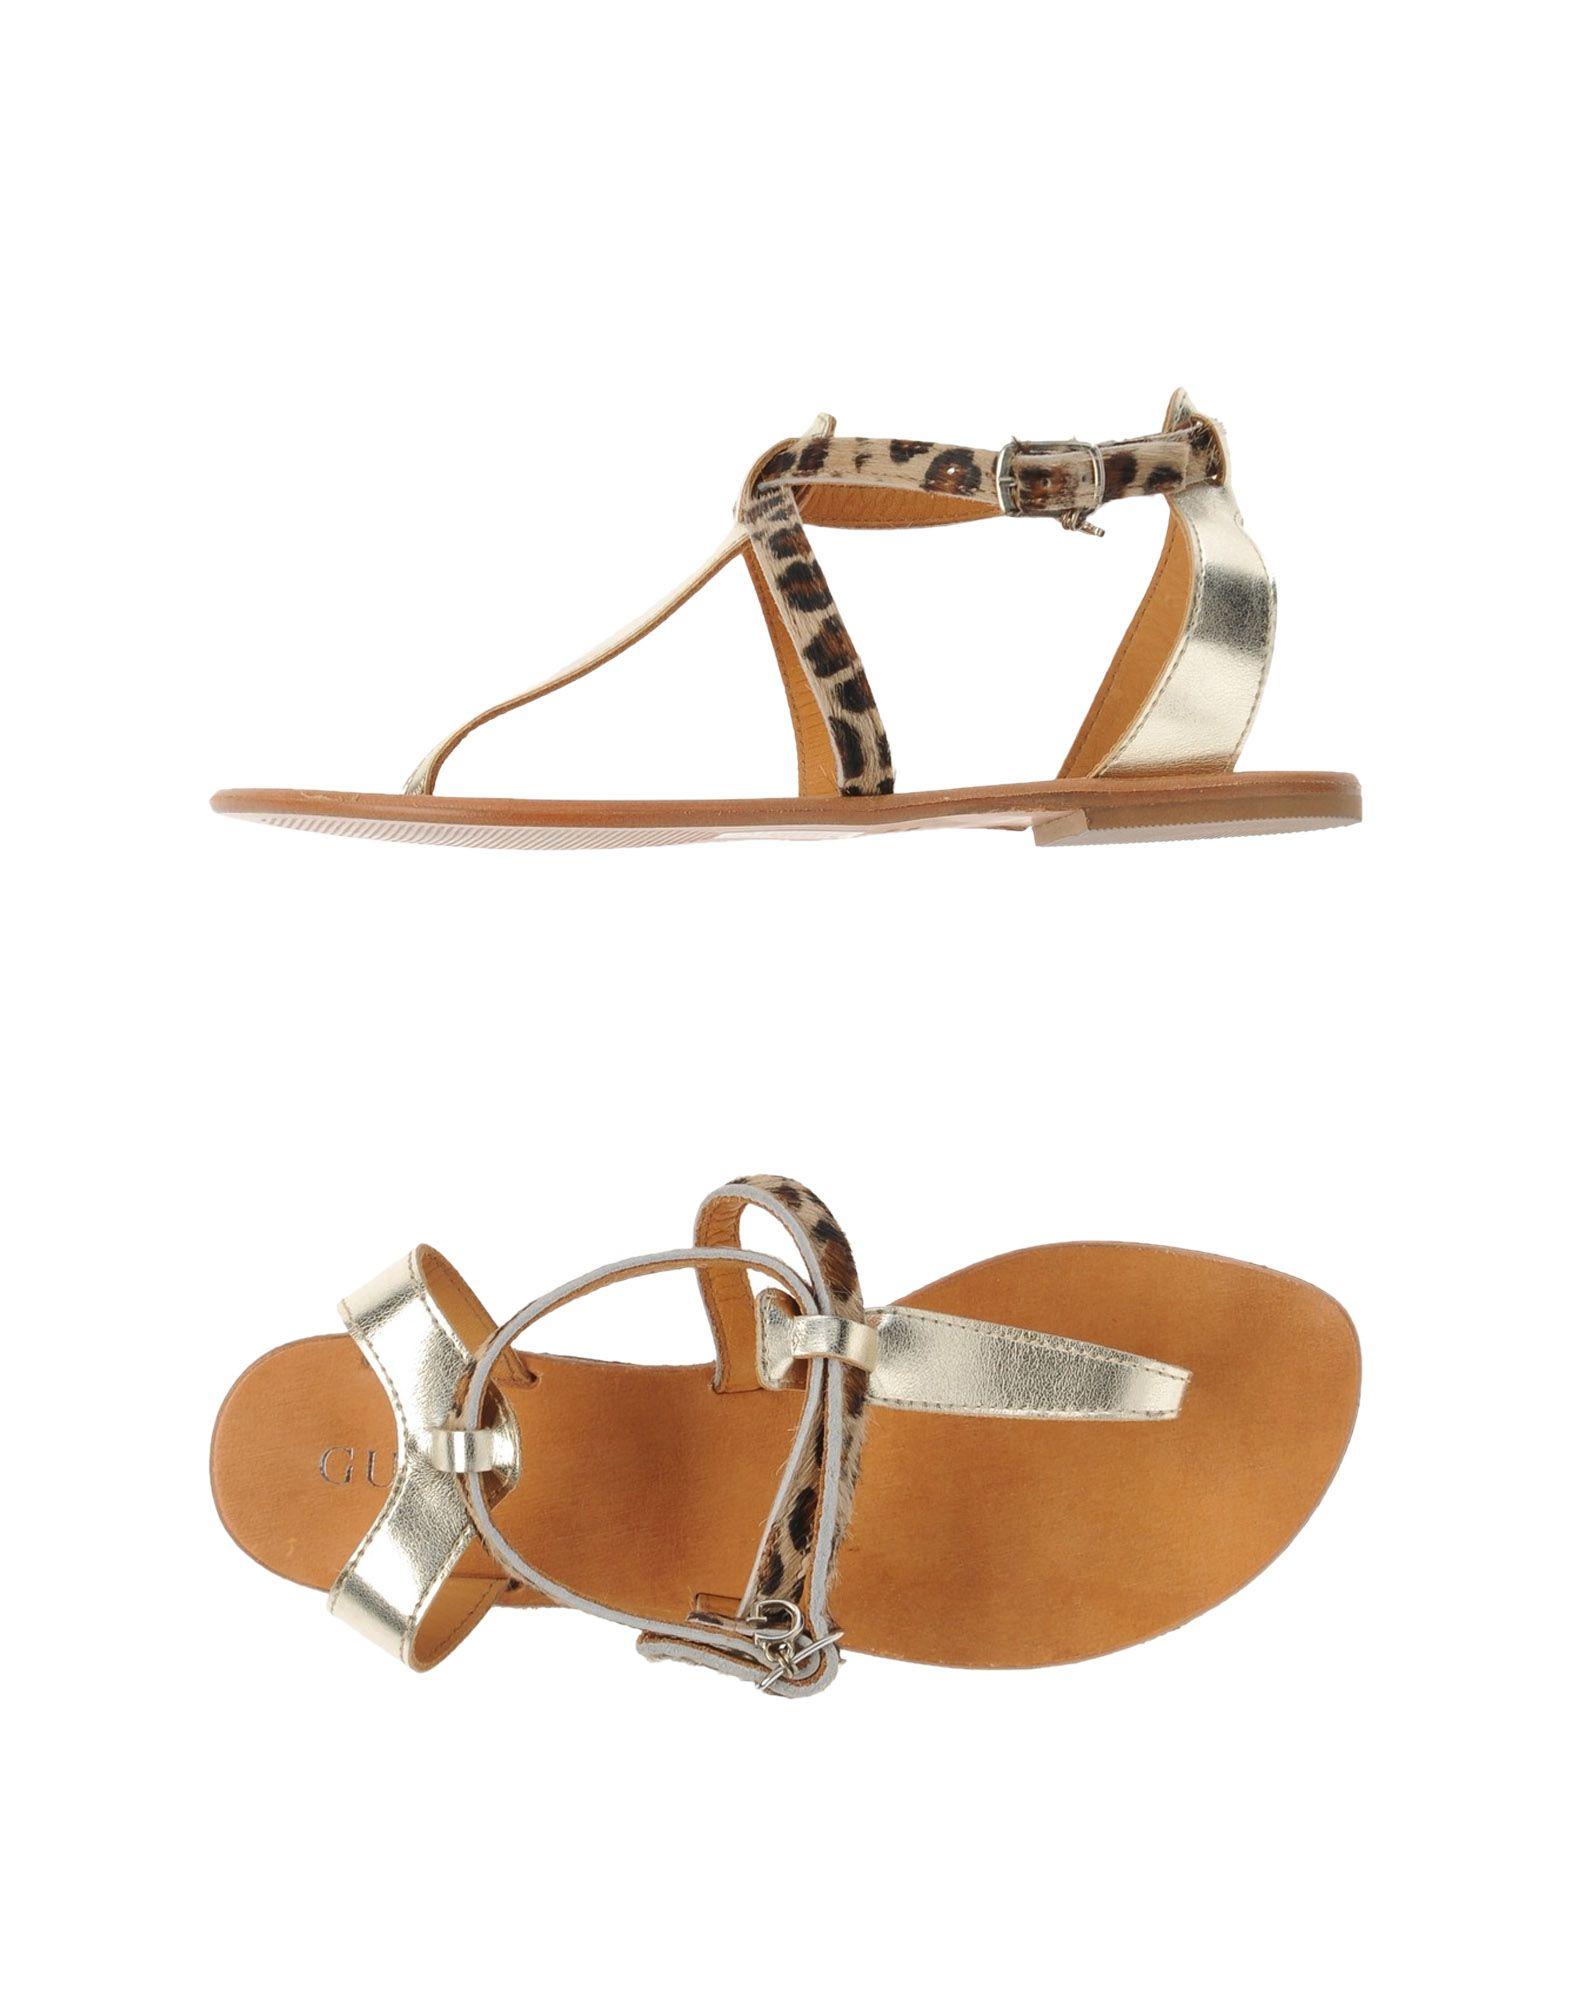 248e6efcca0 Guess Thong Sandal in Metallic - Lyst